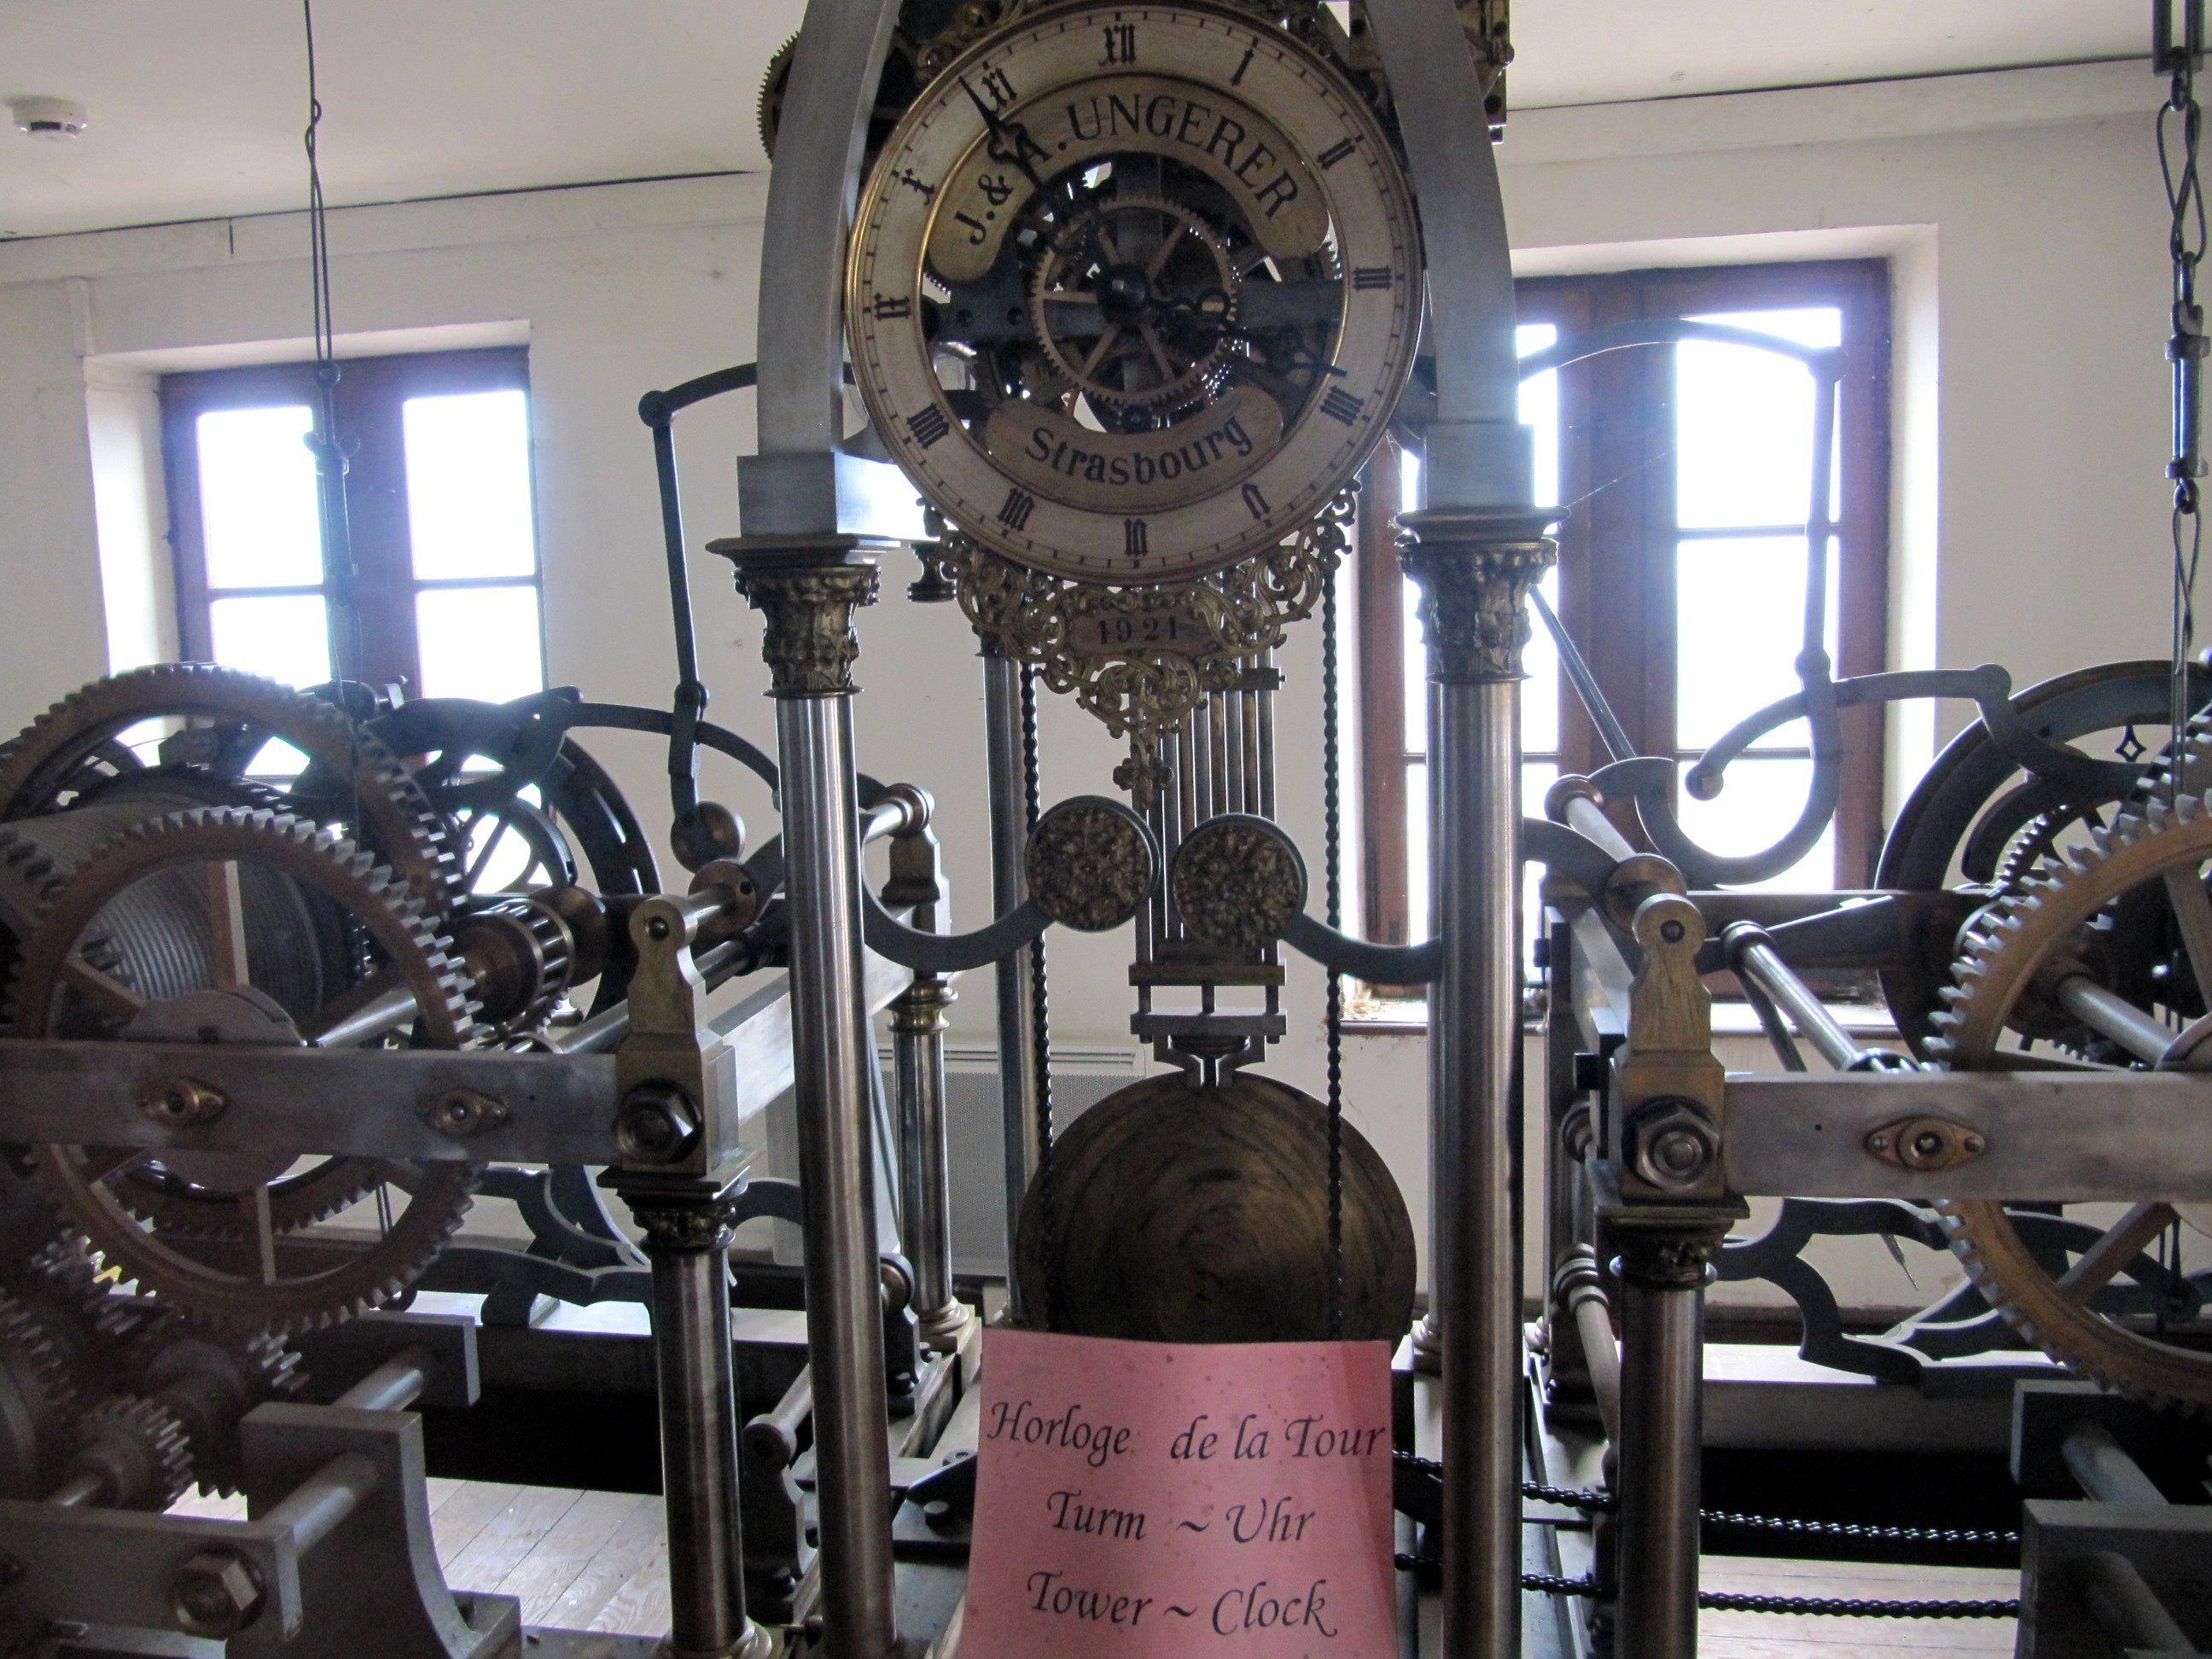 unique tower clocks - Buscar con Google